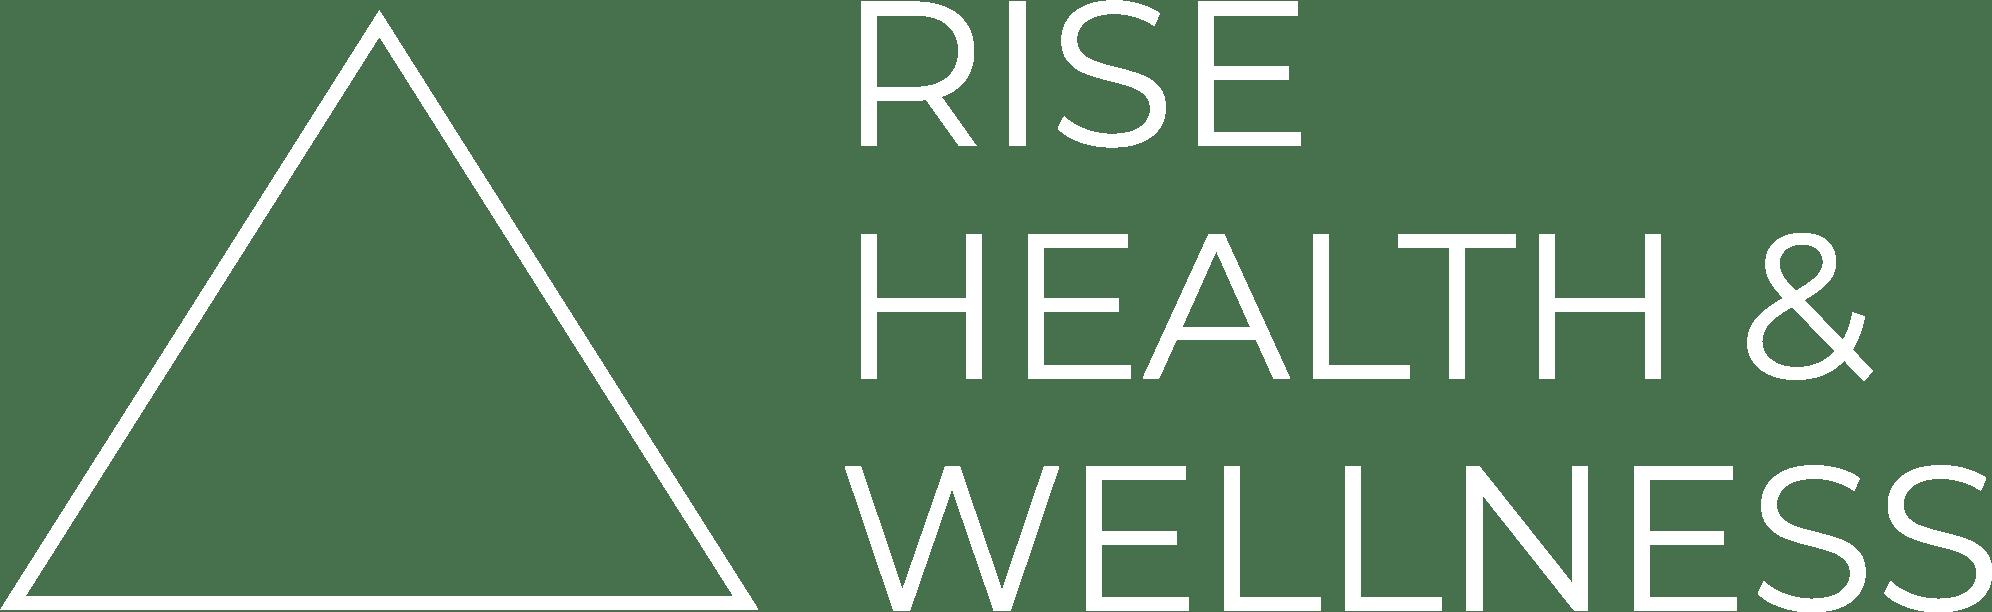 Rise Health and Wellness